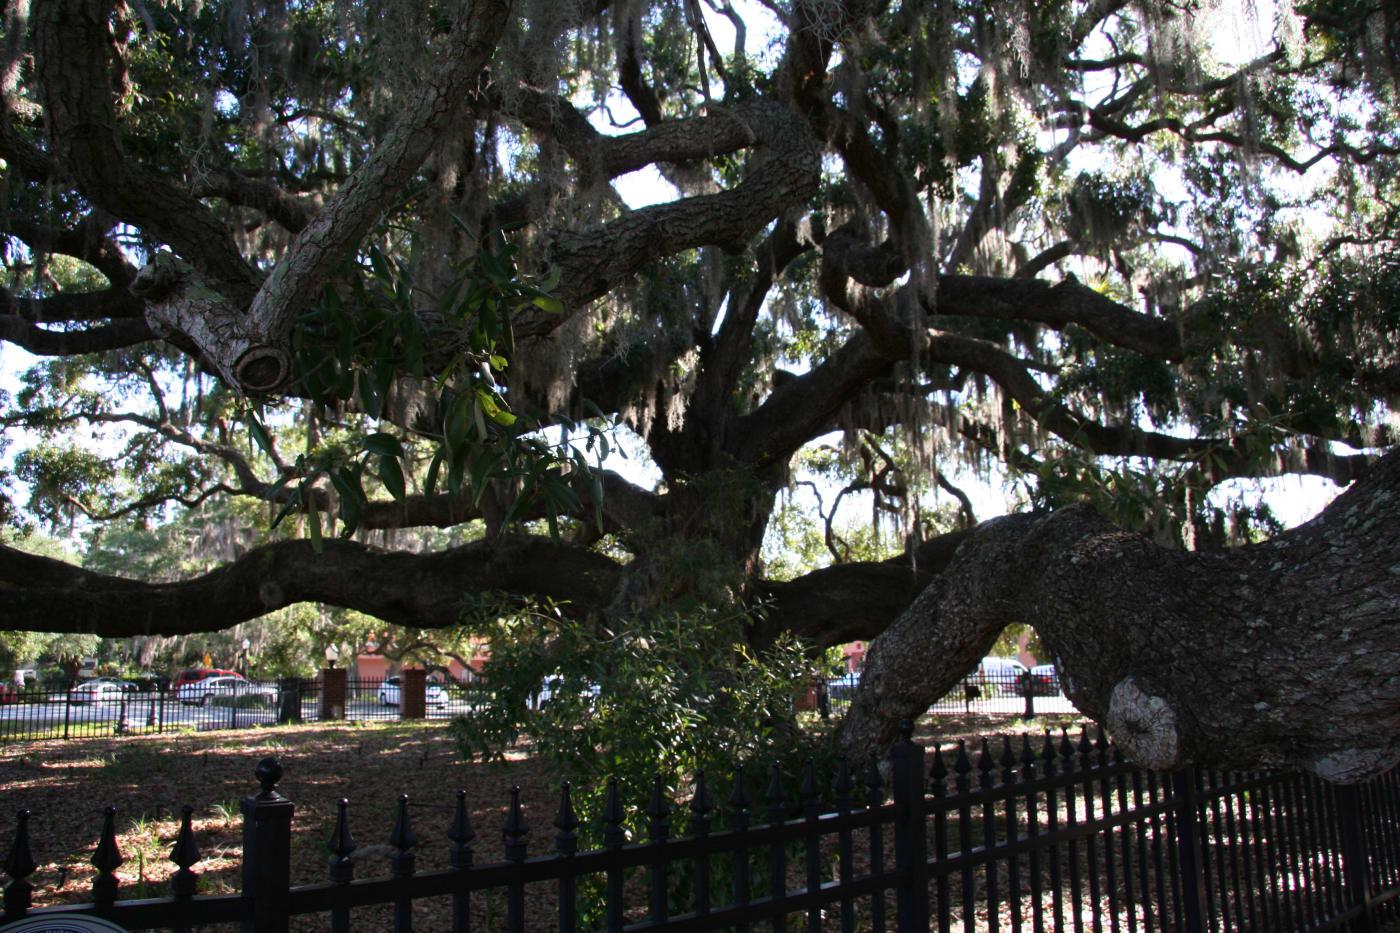 Baranoff-Tree.jpg